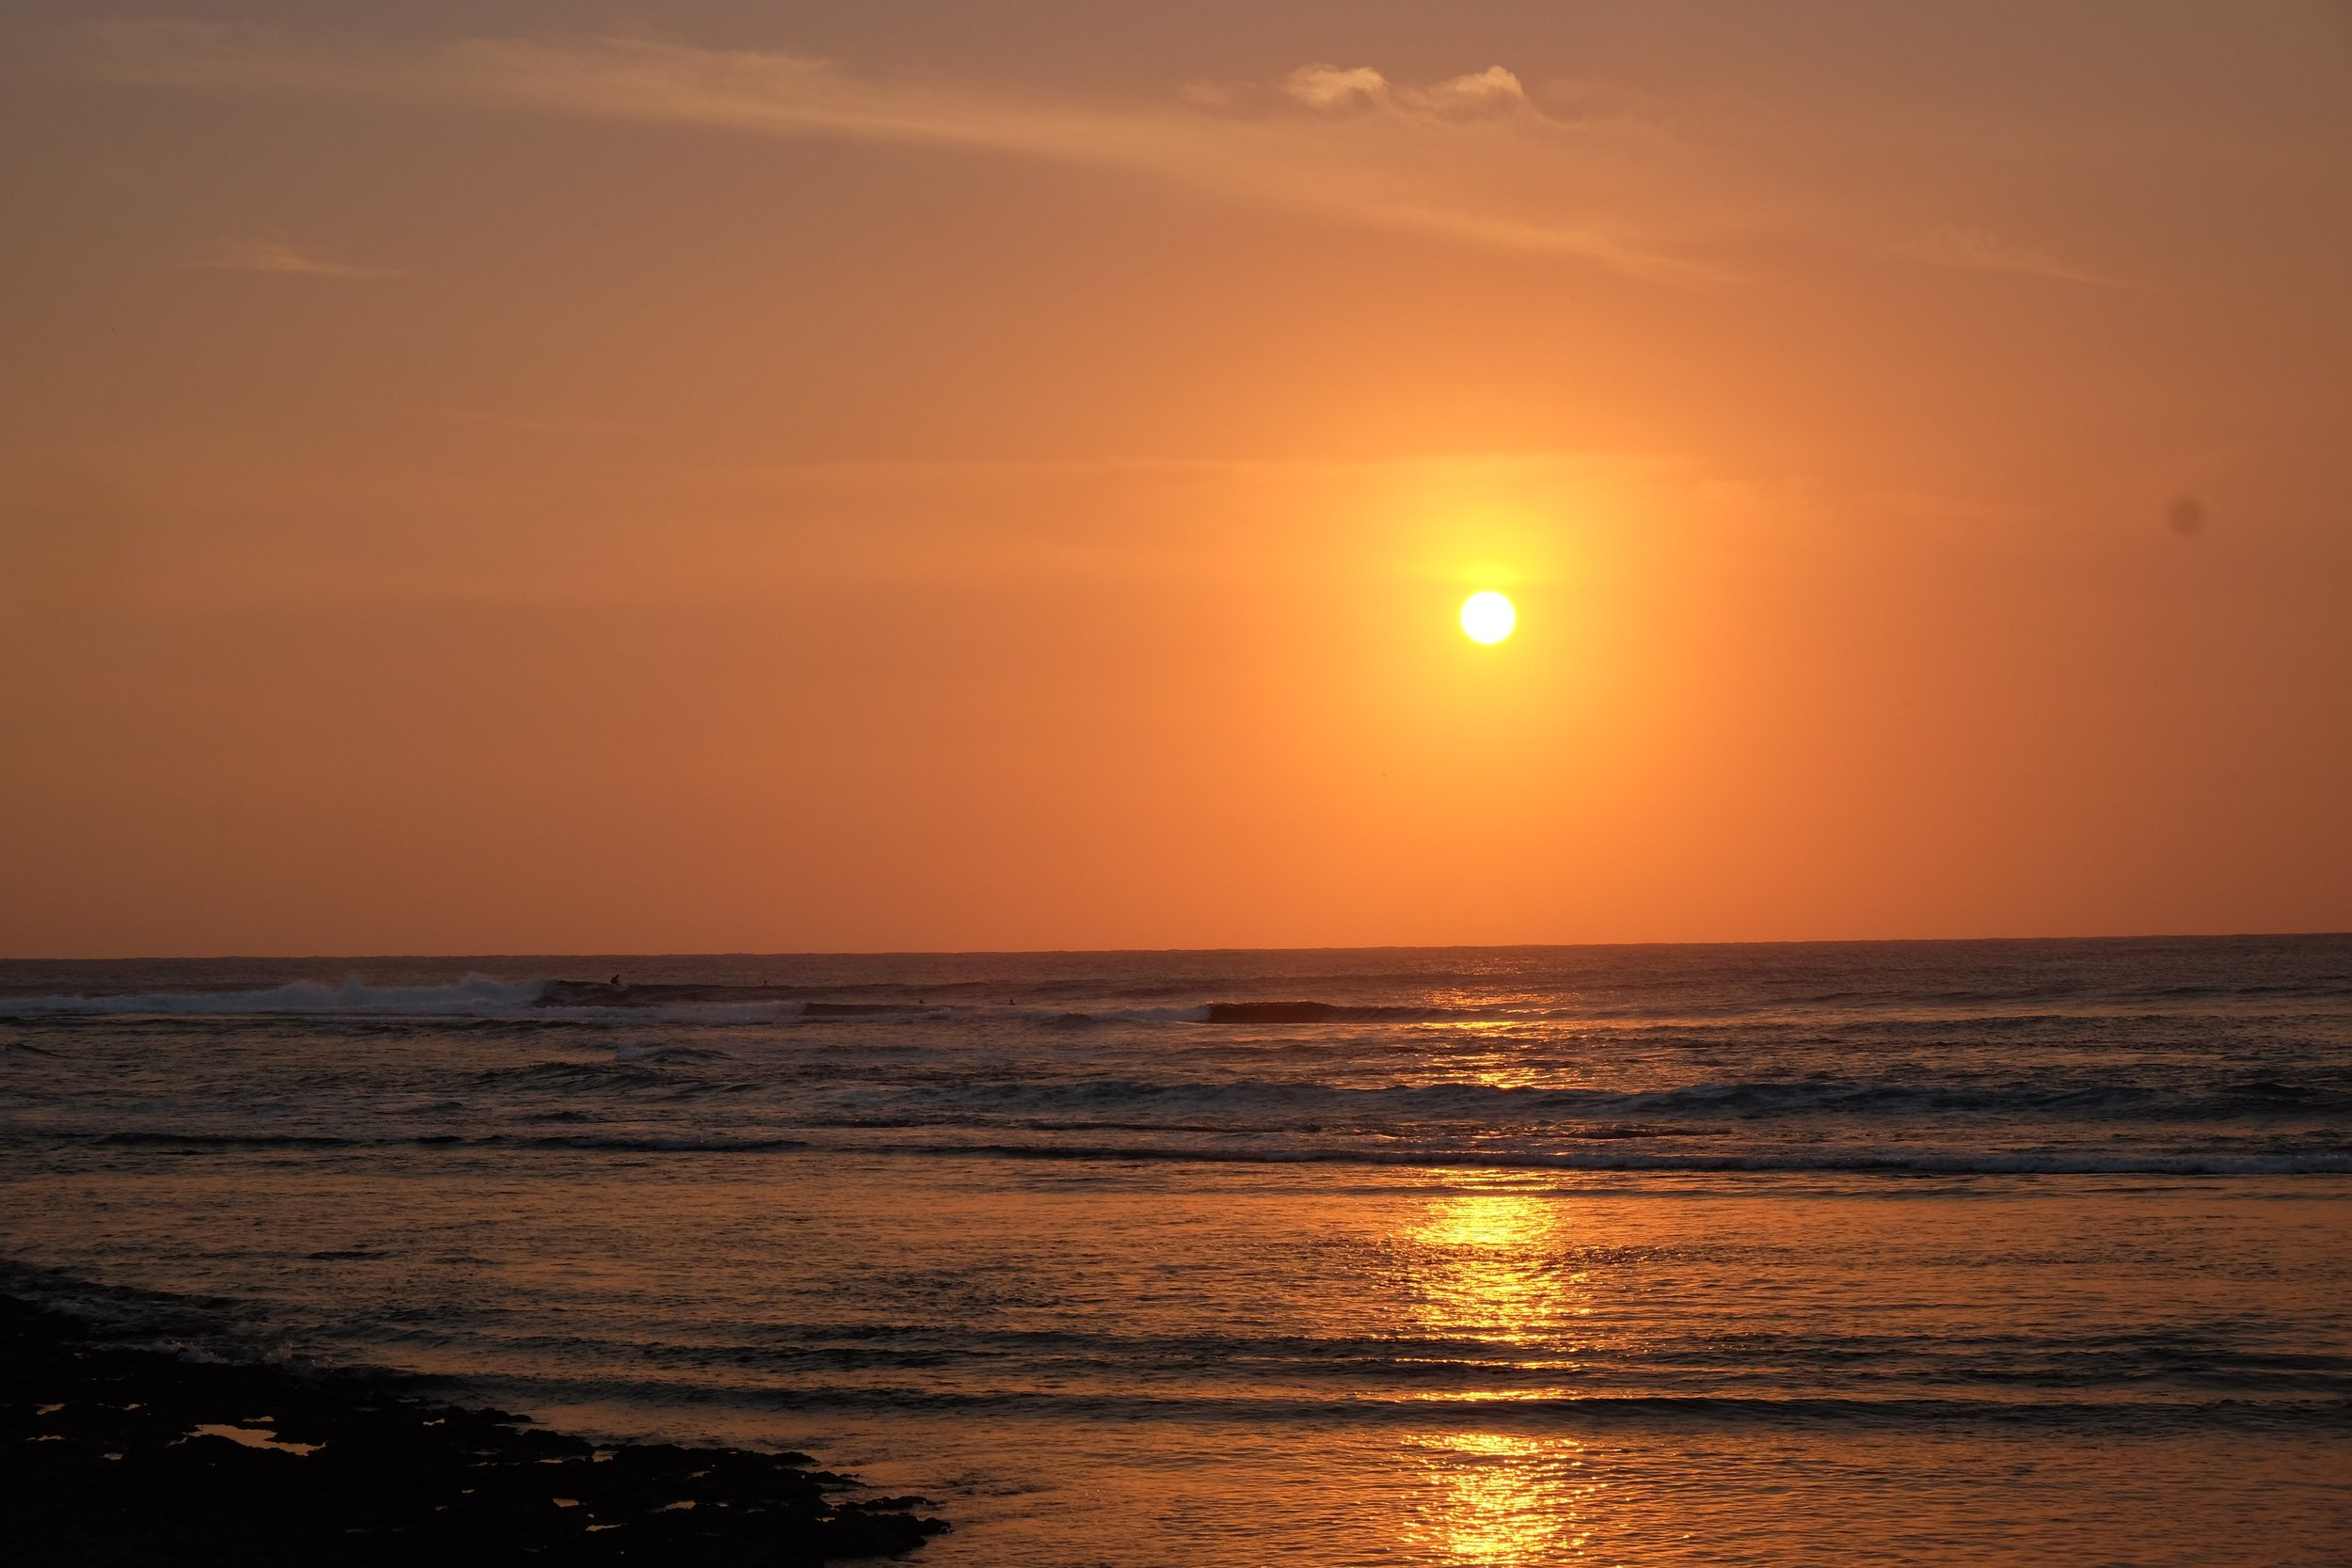 Blazing, skyfilling sunset.